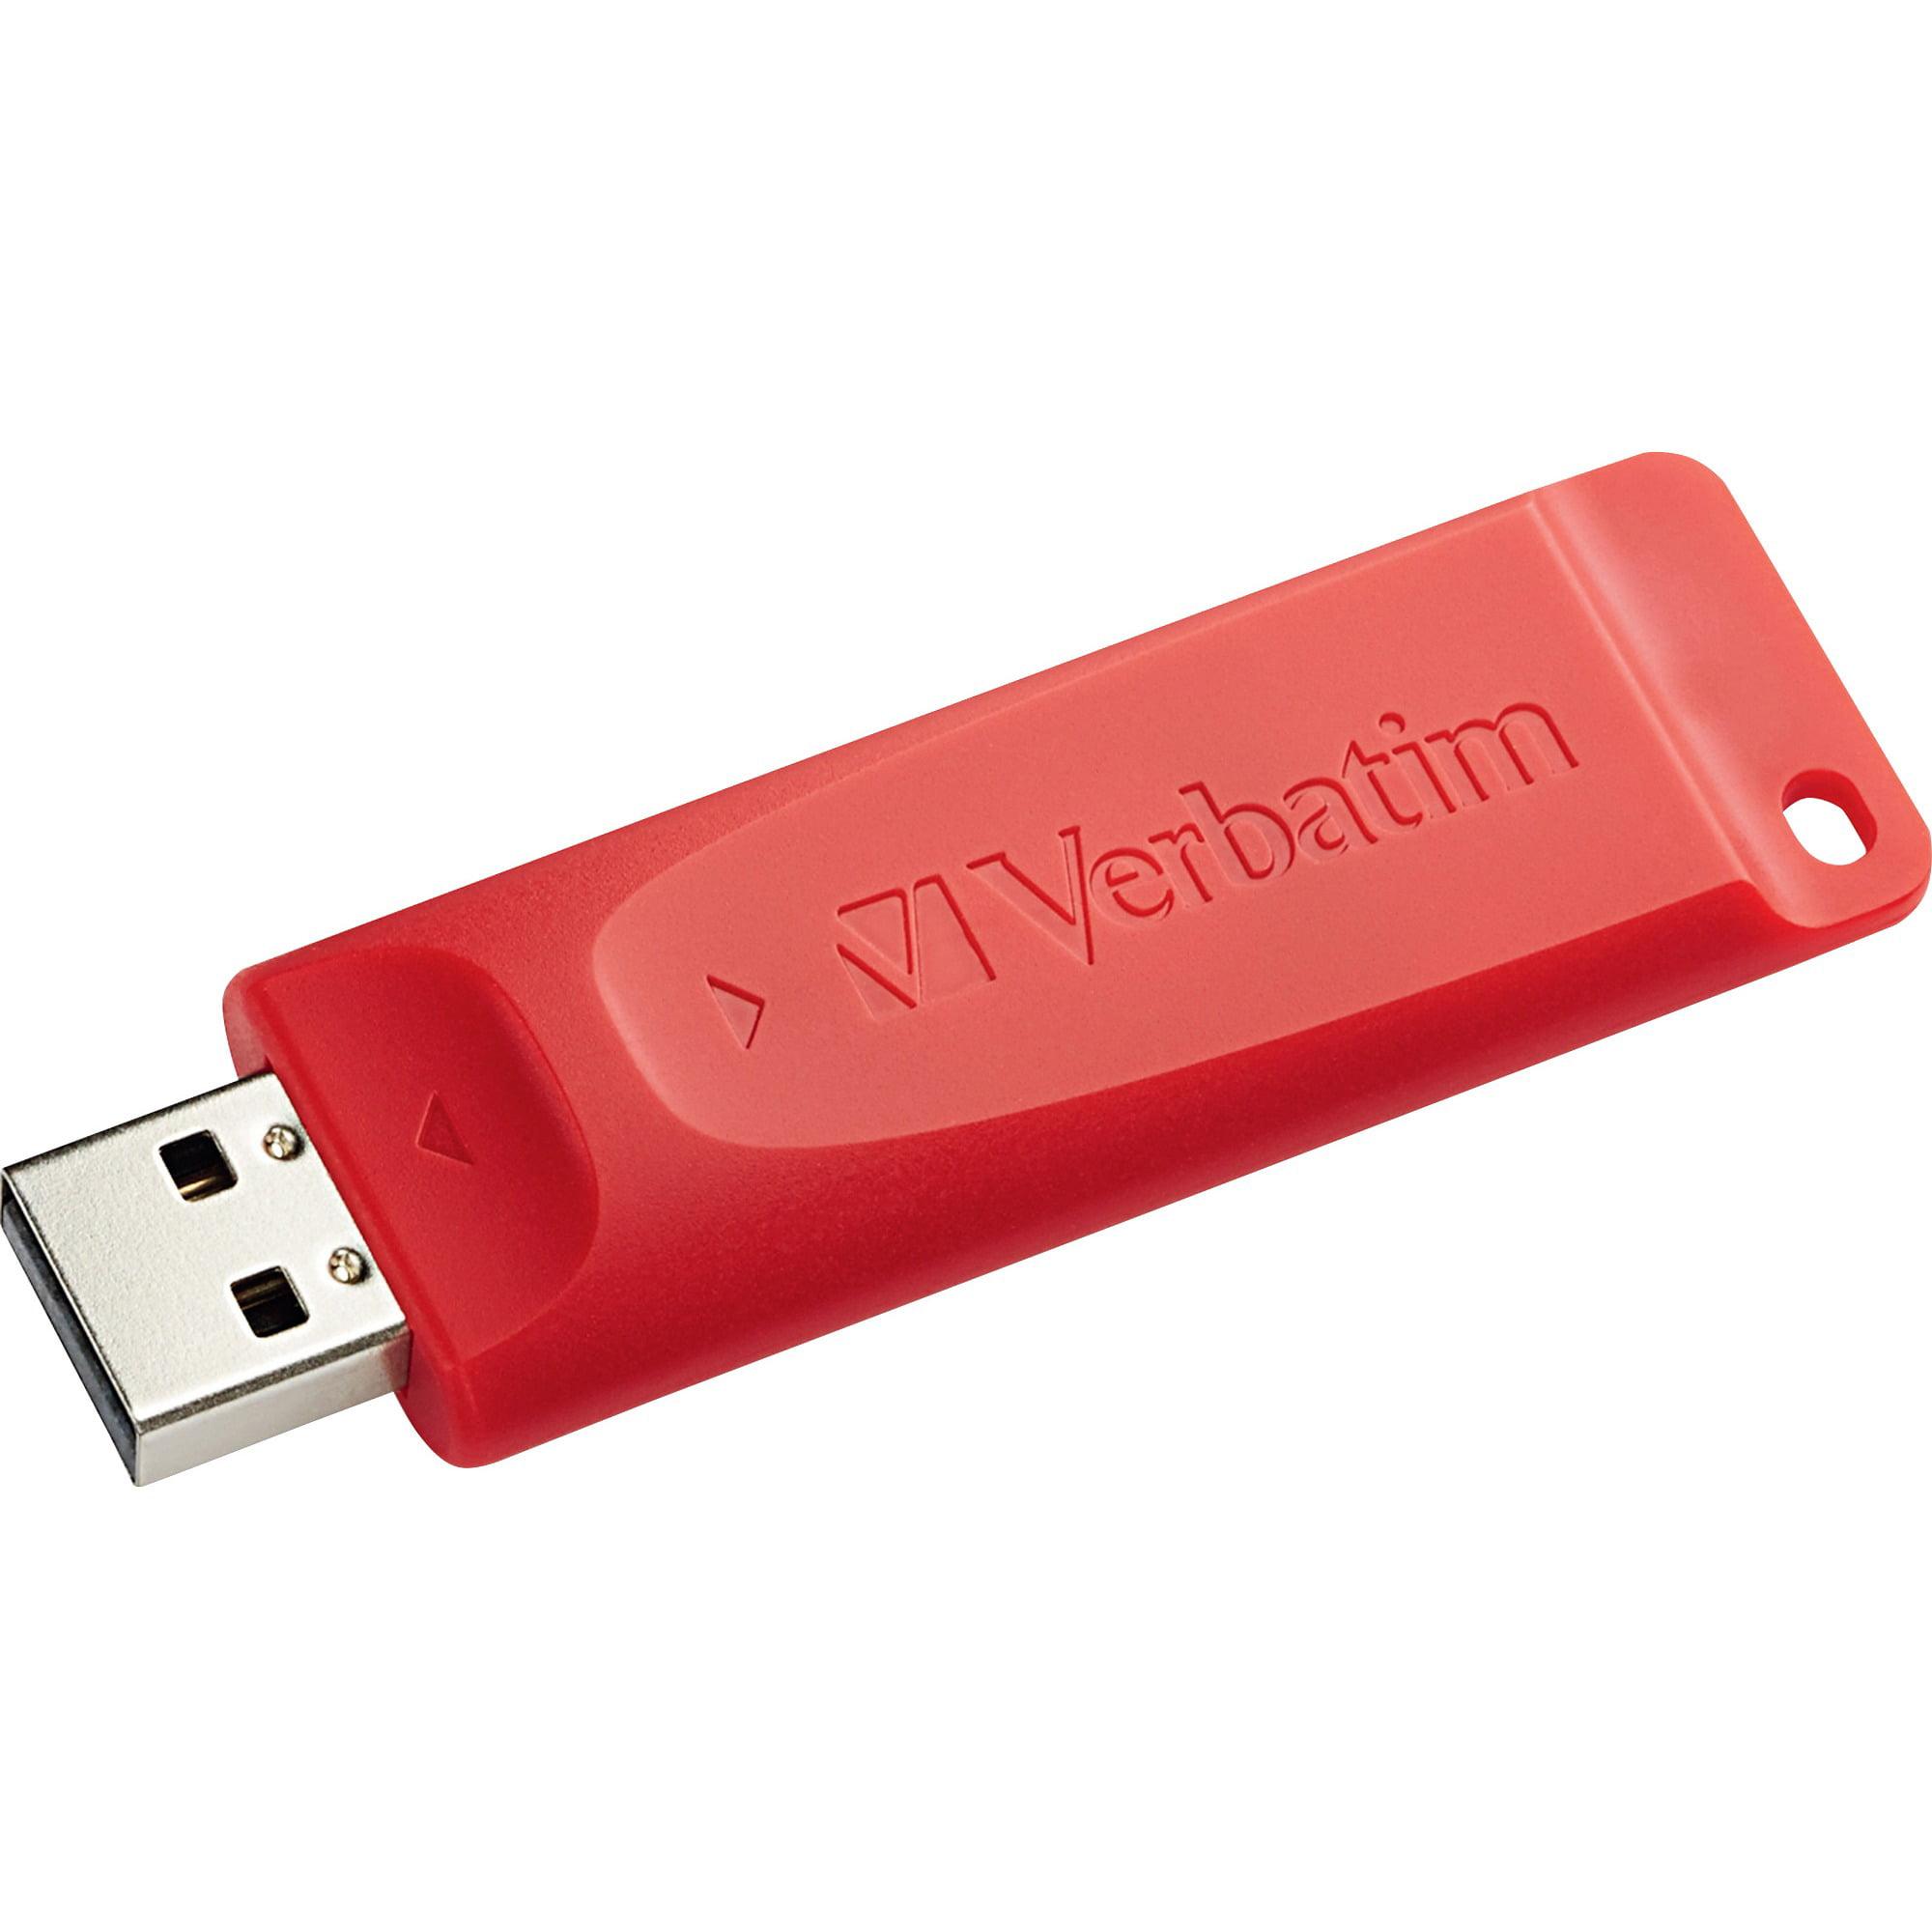 Verbatim, VER96317, Store N' Go USB Drive, 1 Each, Red